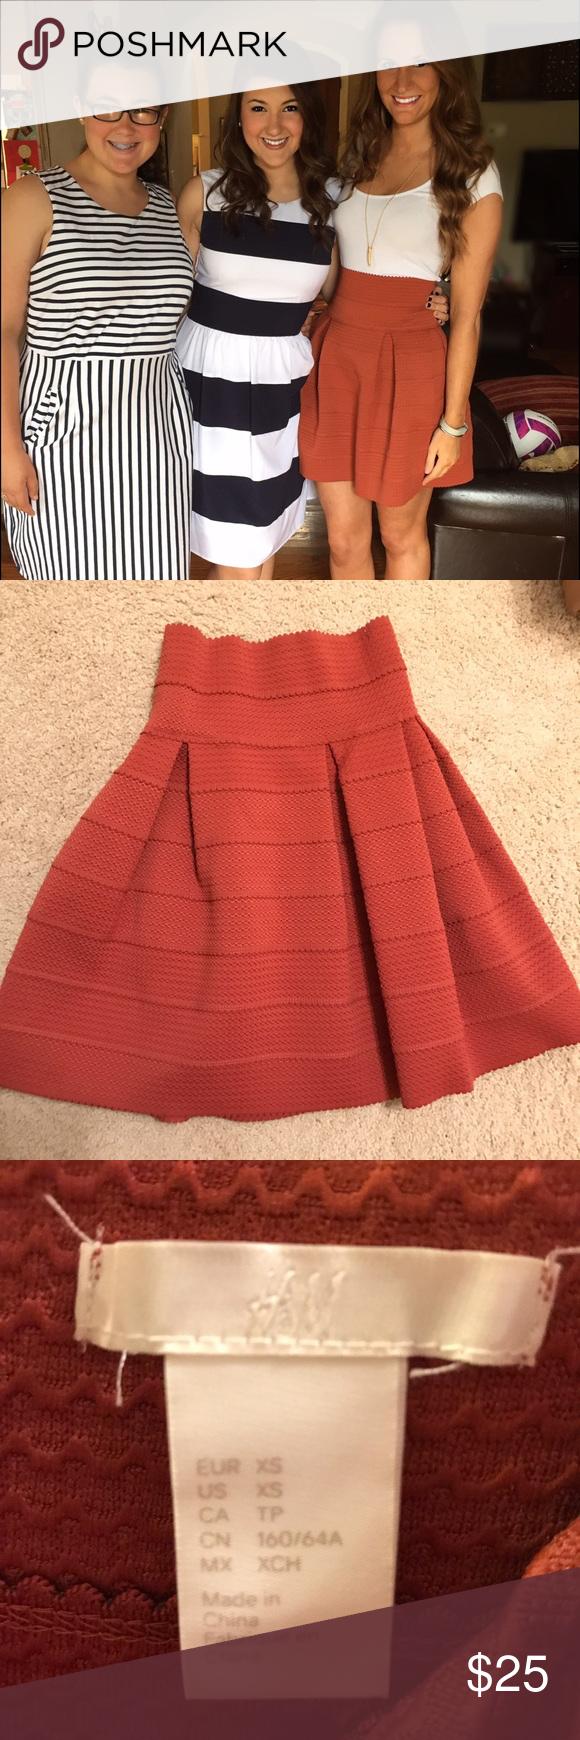 536f5385e HM high waisted skirt Burnt orange and very flattering! H&M Skirts Midi